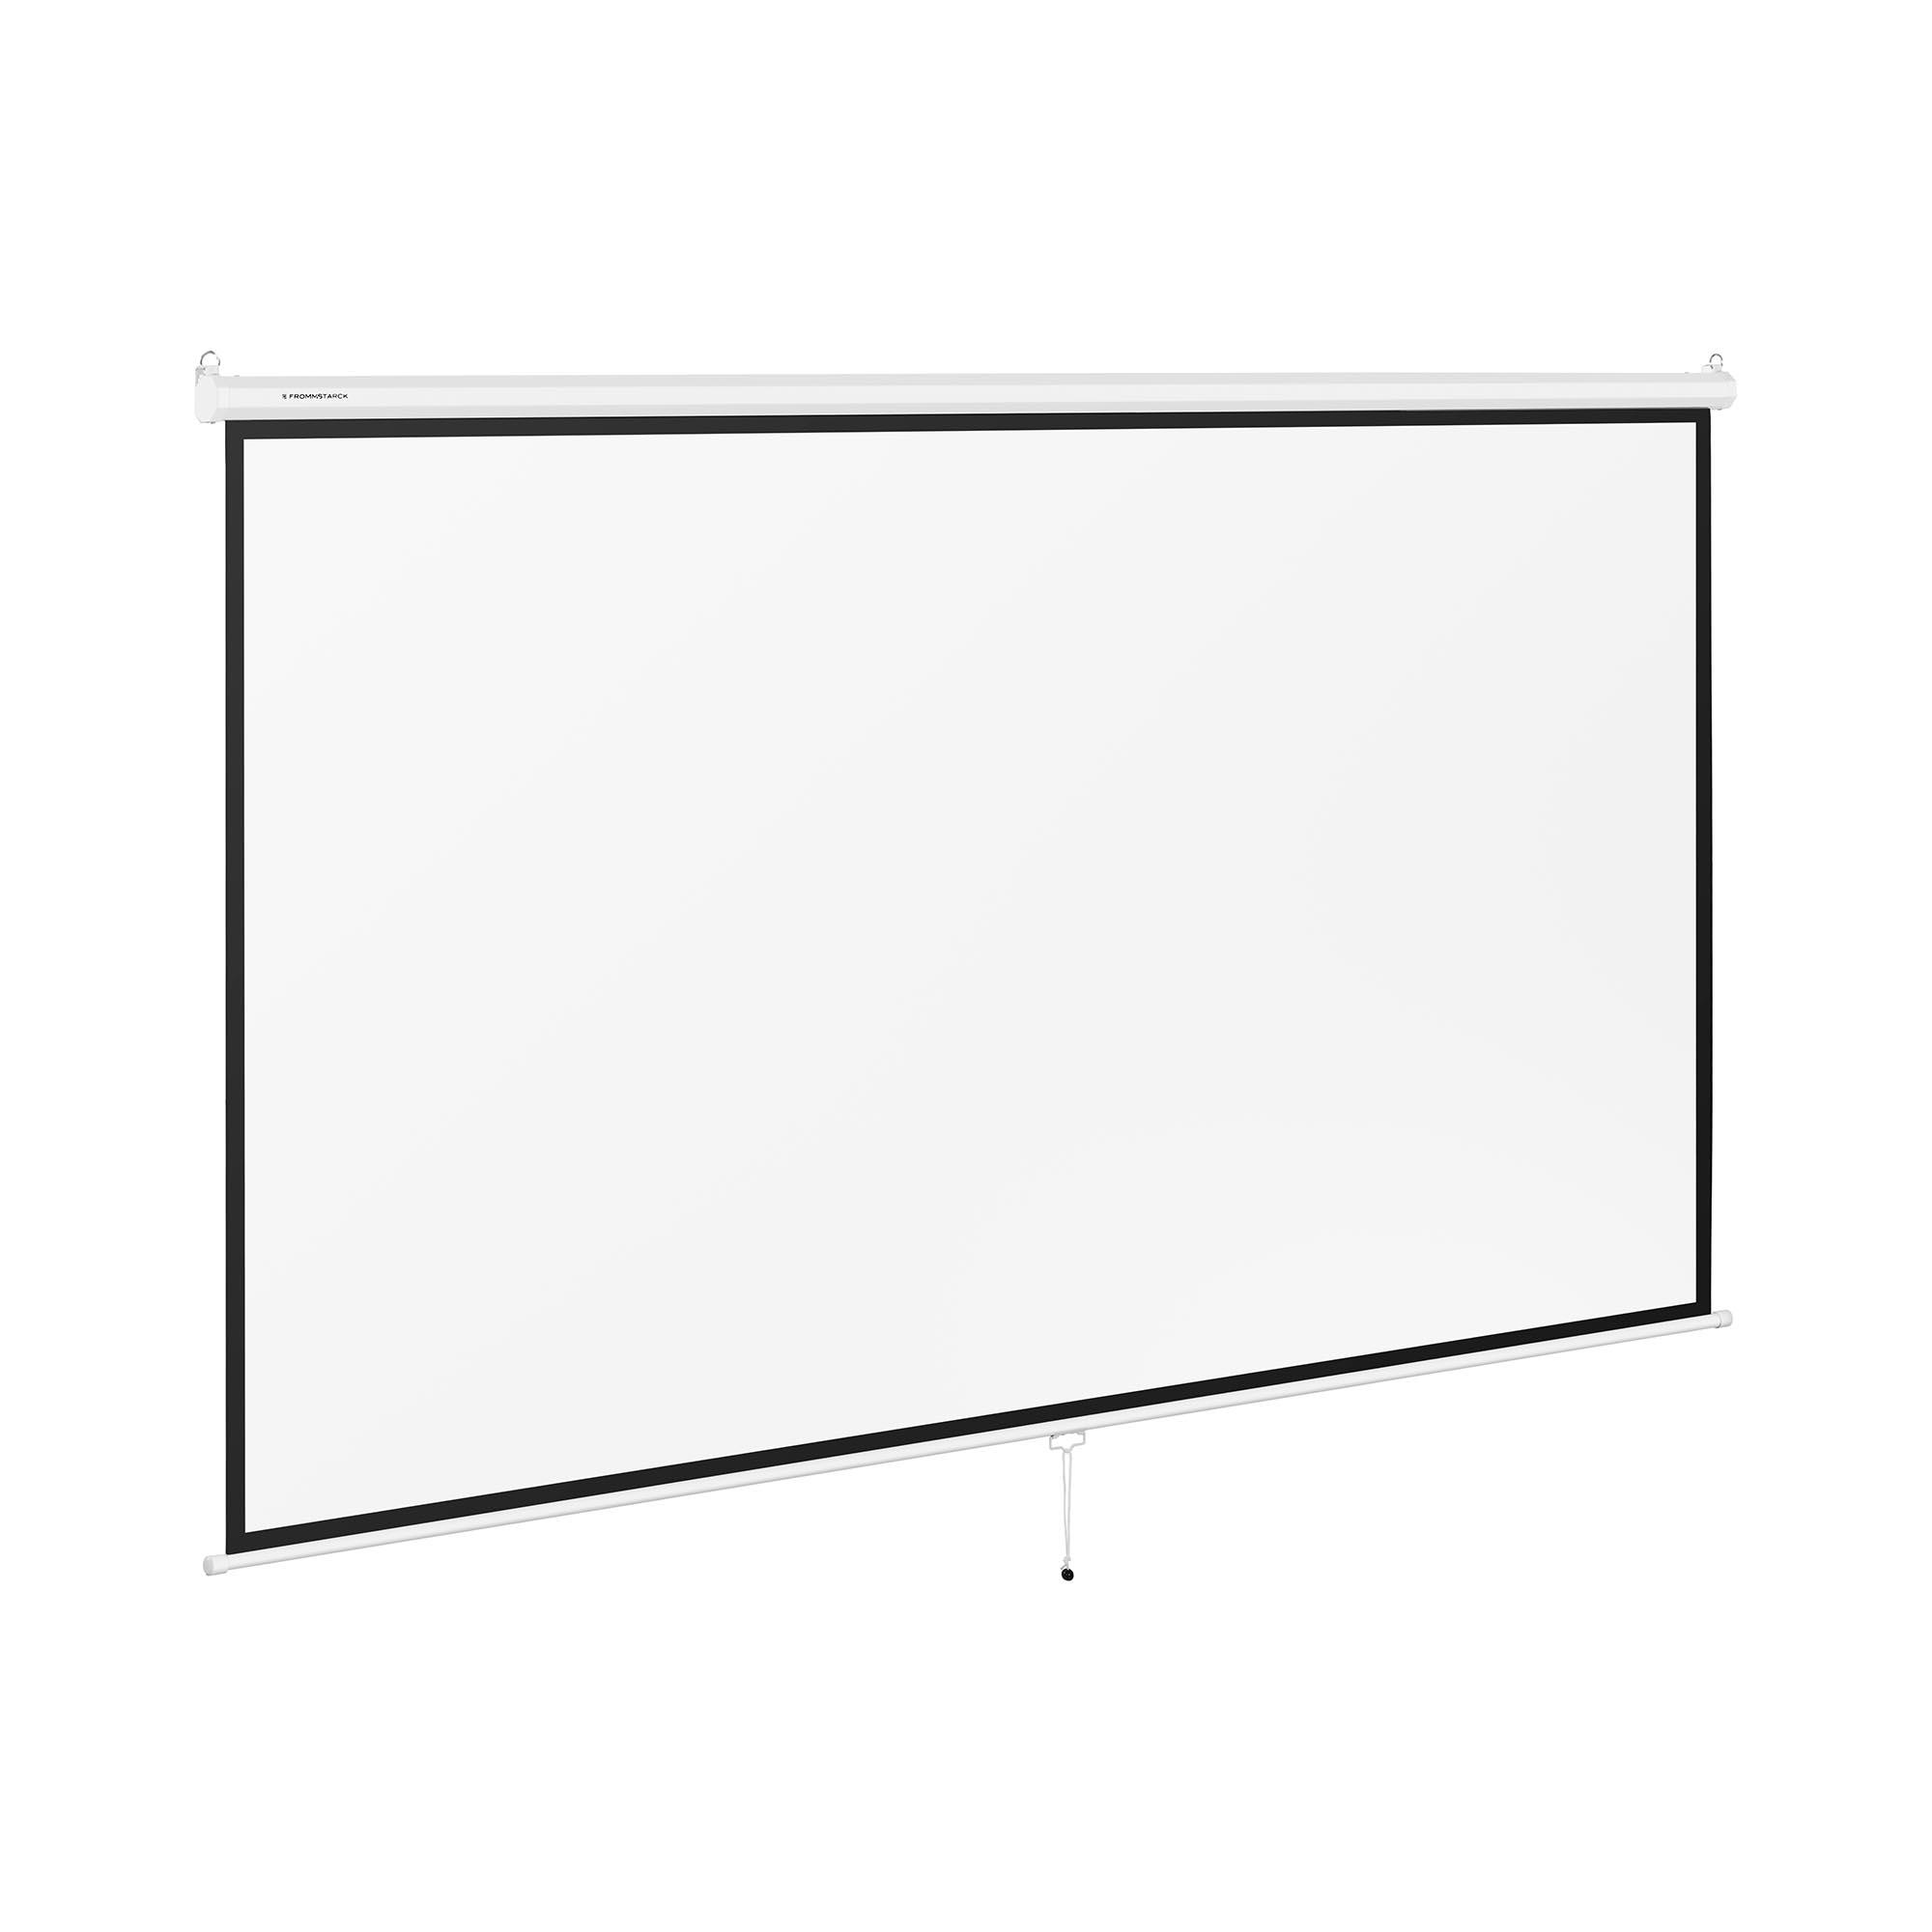 Fromm & Starck Beamerleinwand - 340 x 210 cm - 16:9 10260085